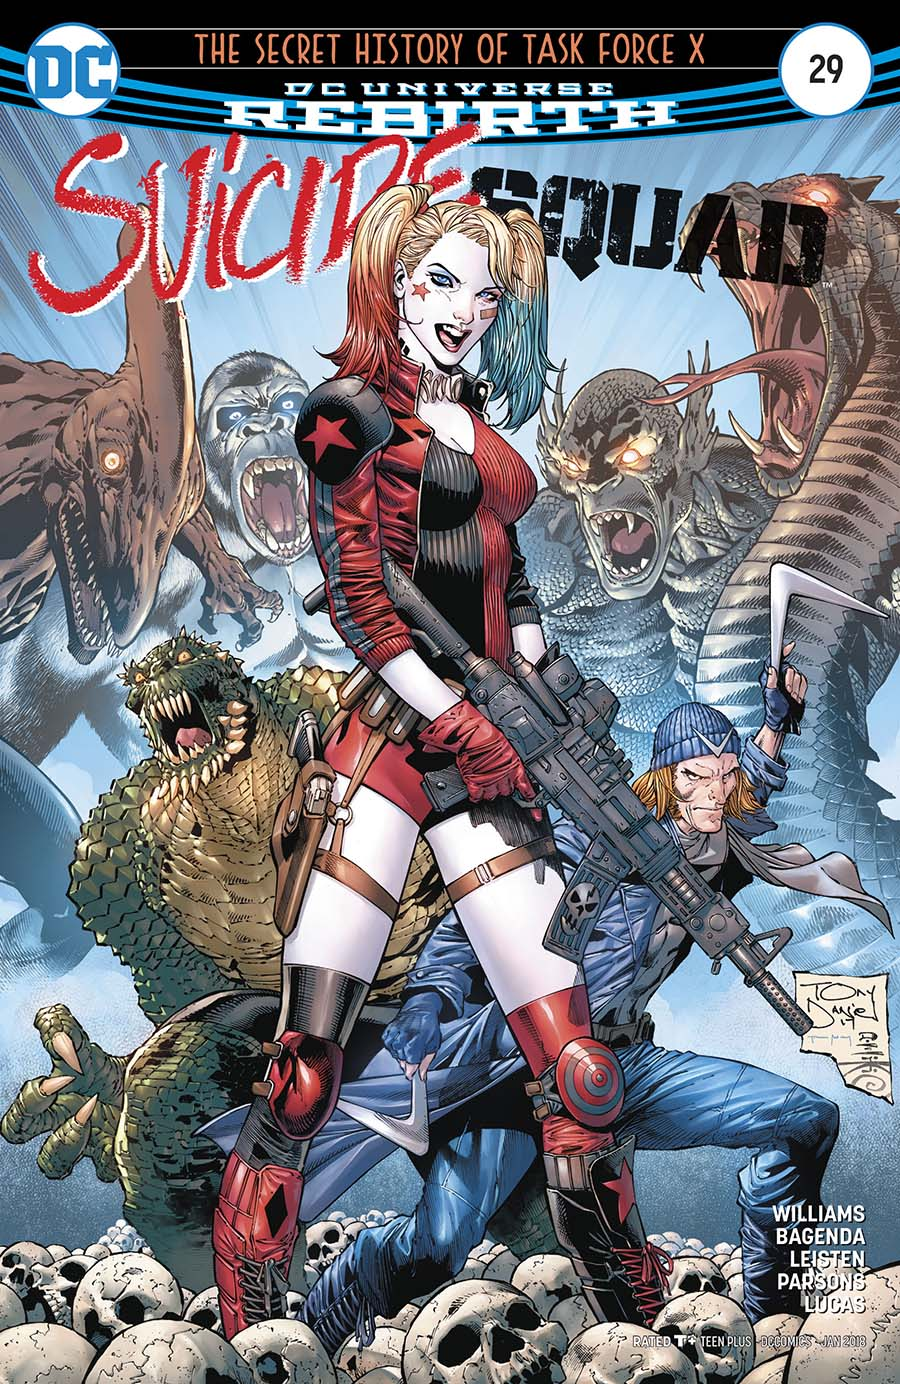 Suicide Squad Vol 4 #29 Cover A Regular Tony S Daniel & Danny Miki Cover